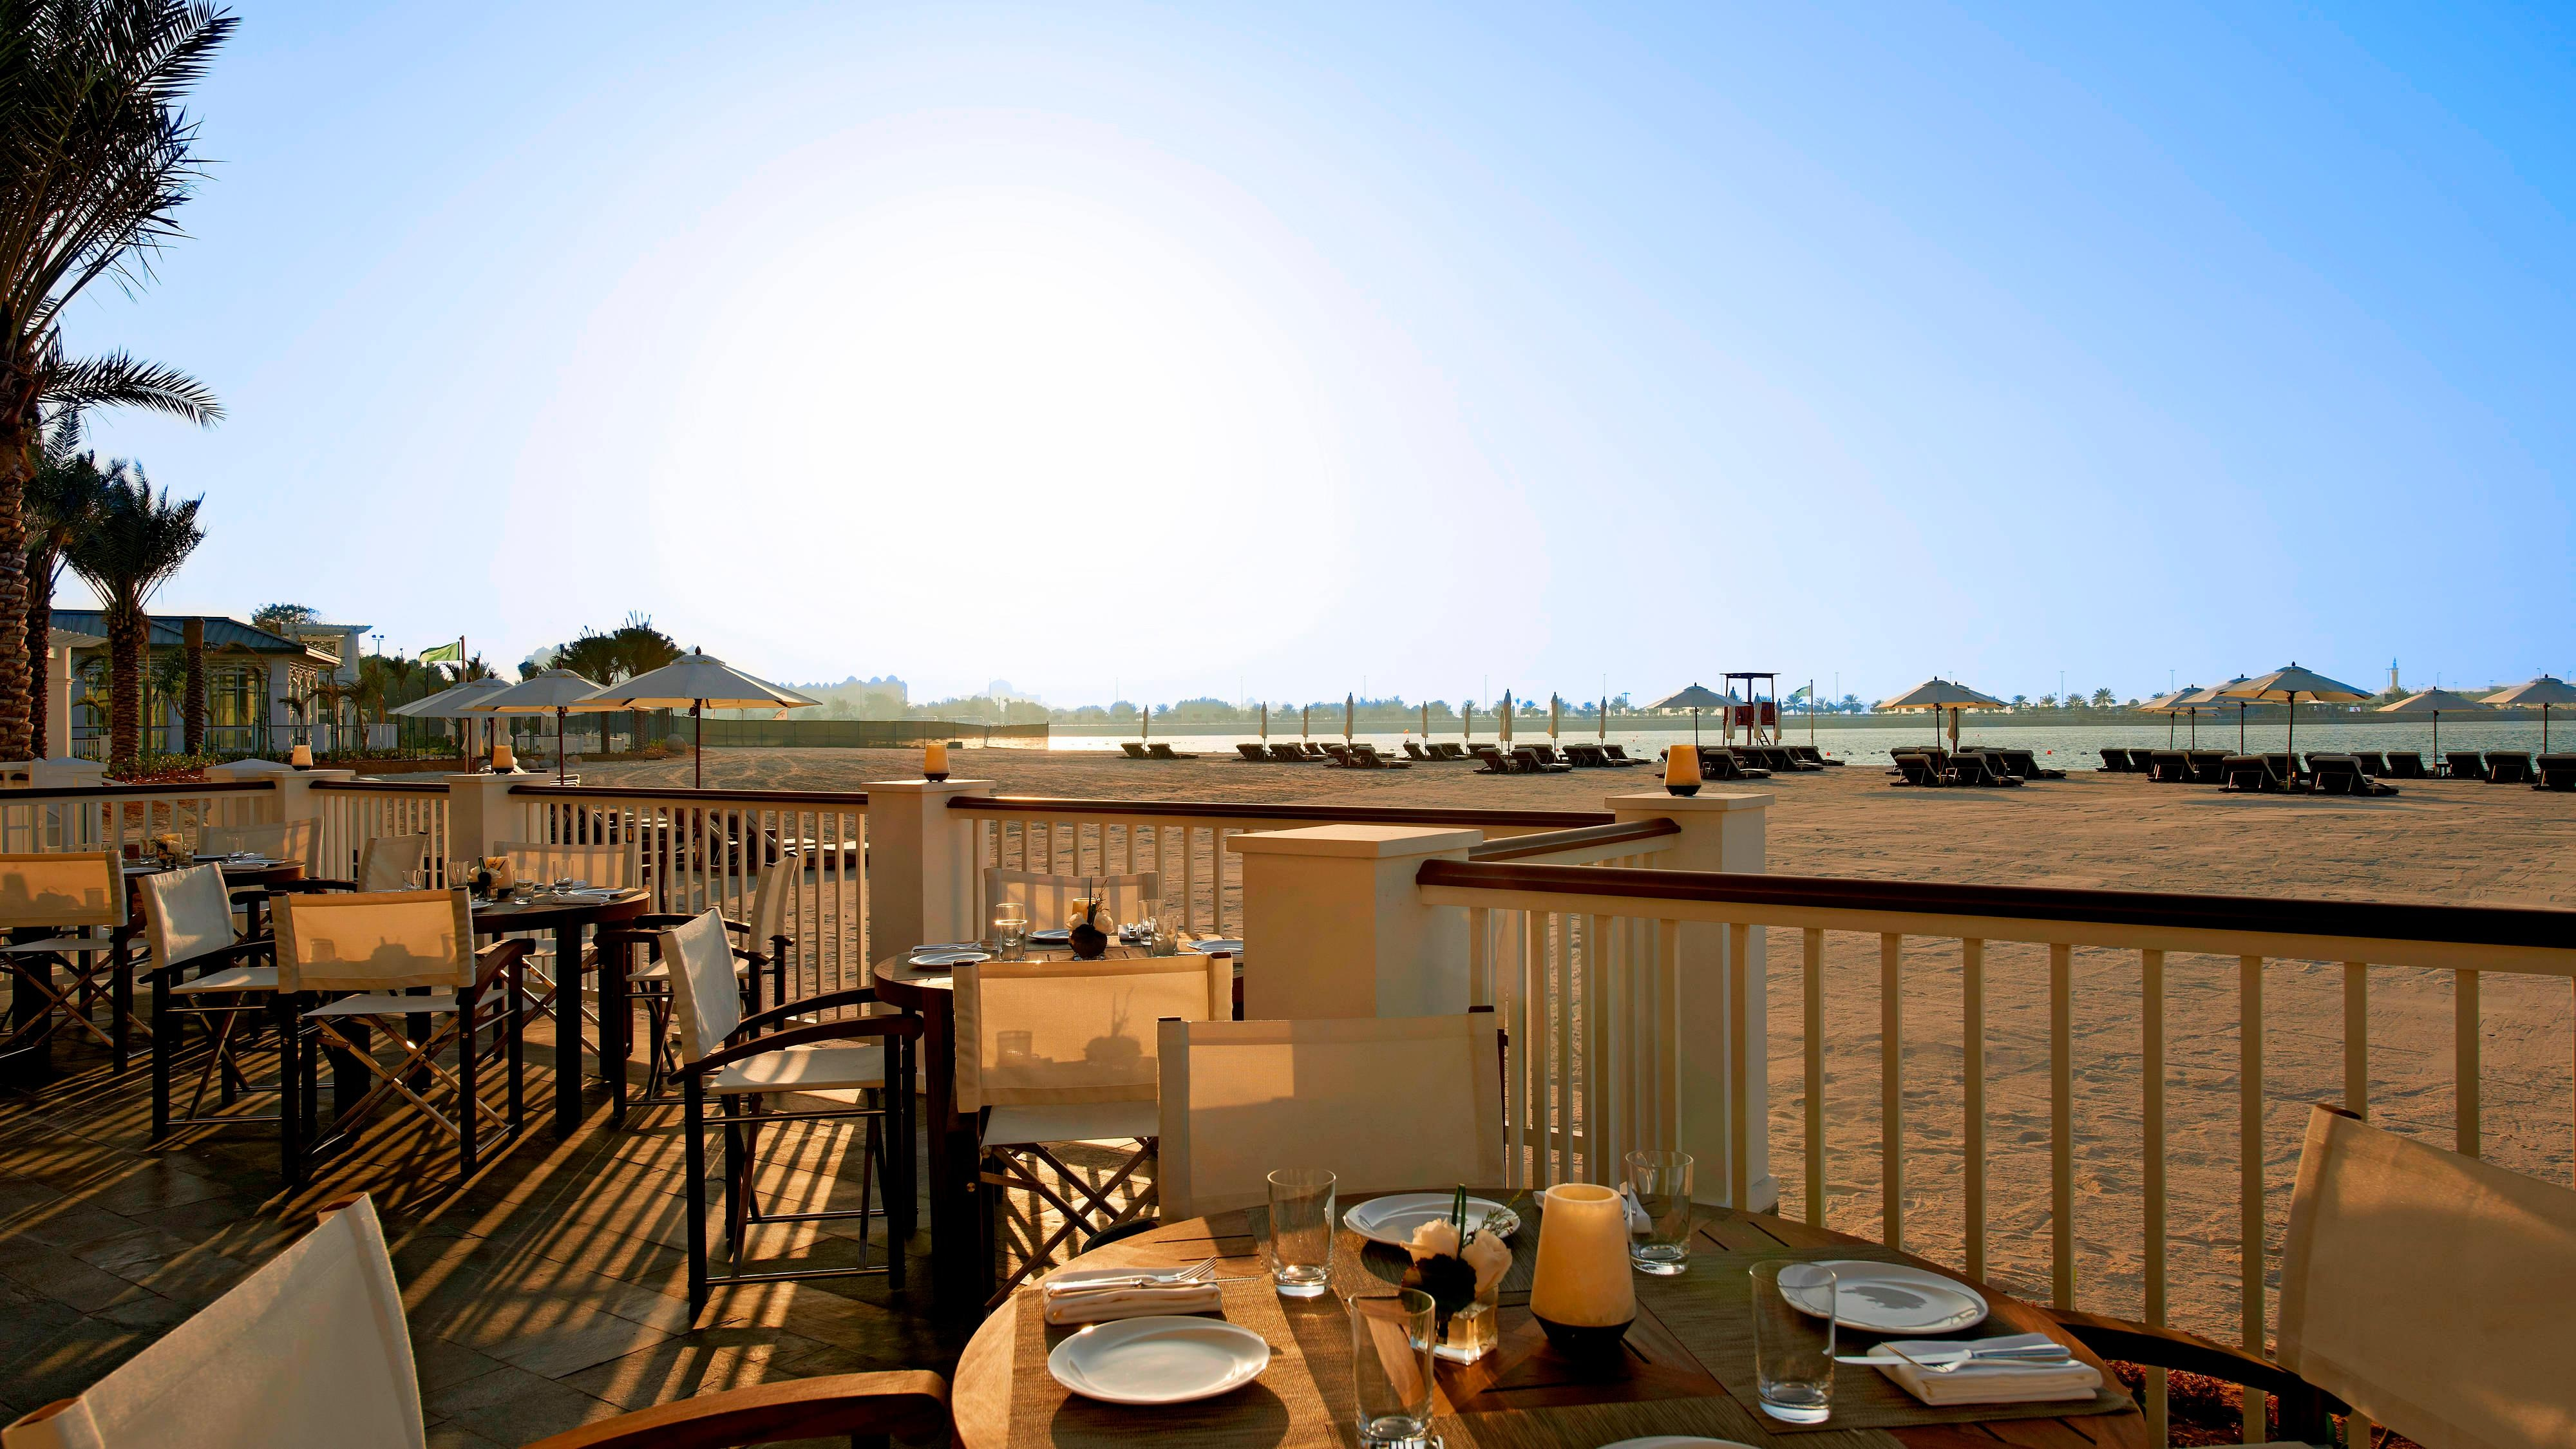 Nation Riviera Beach Club - Cabana Bar & Grill